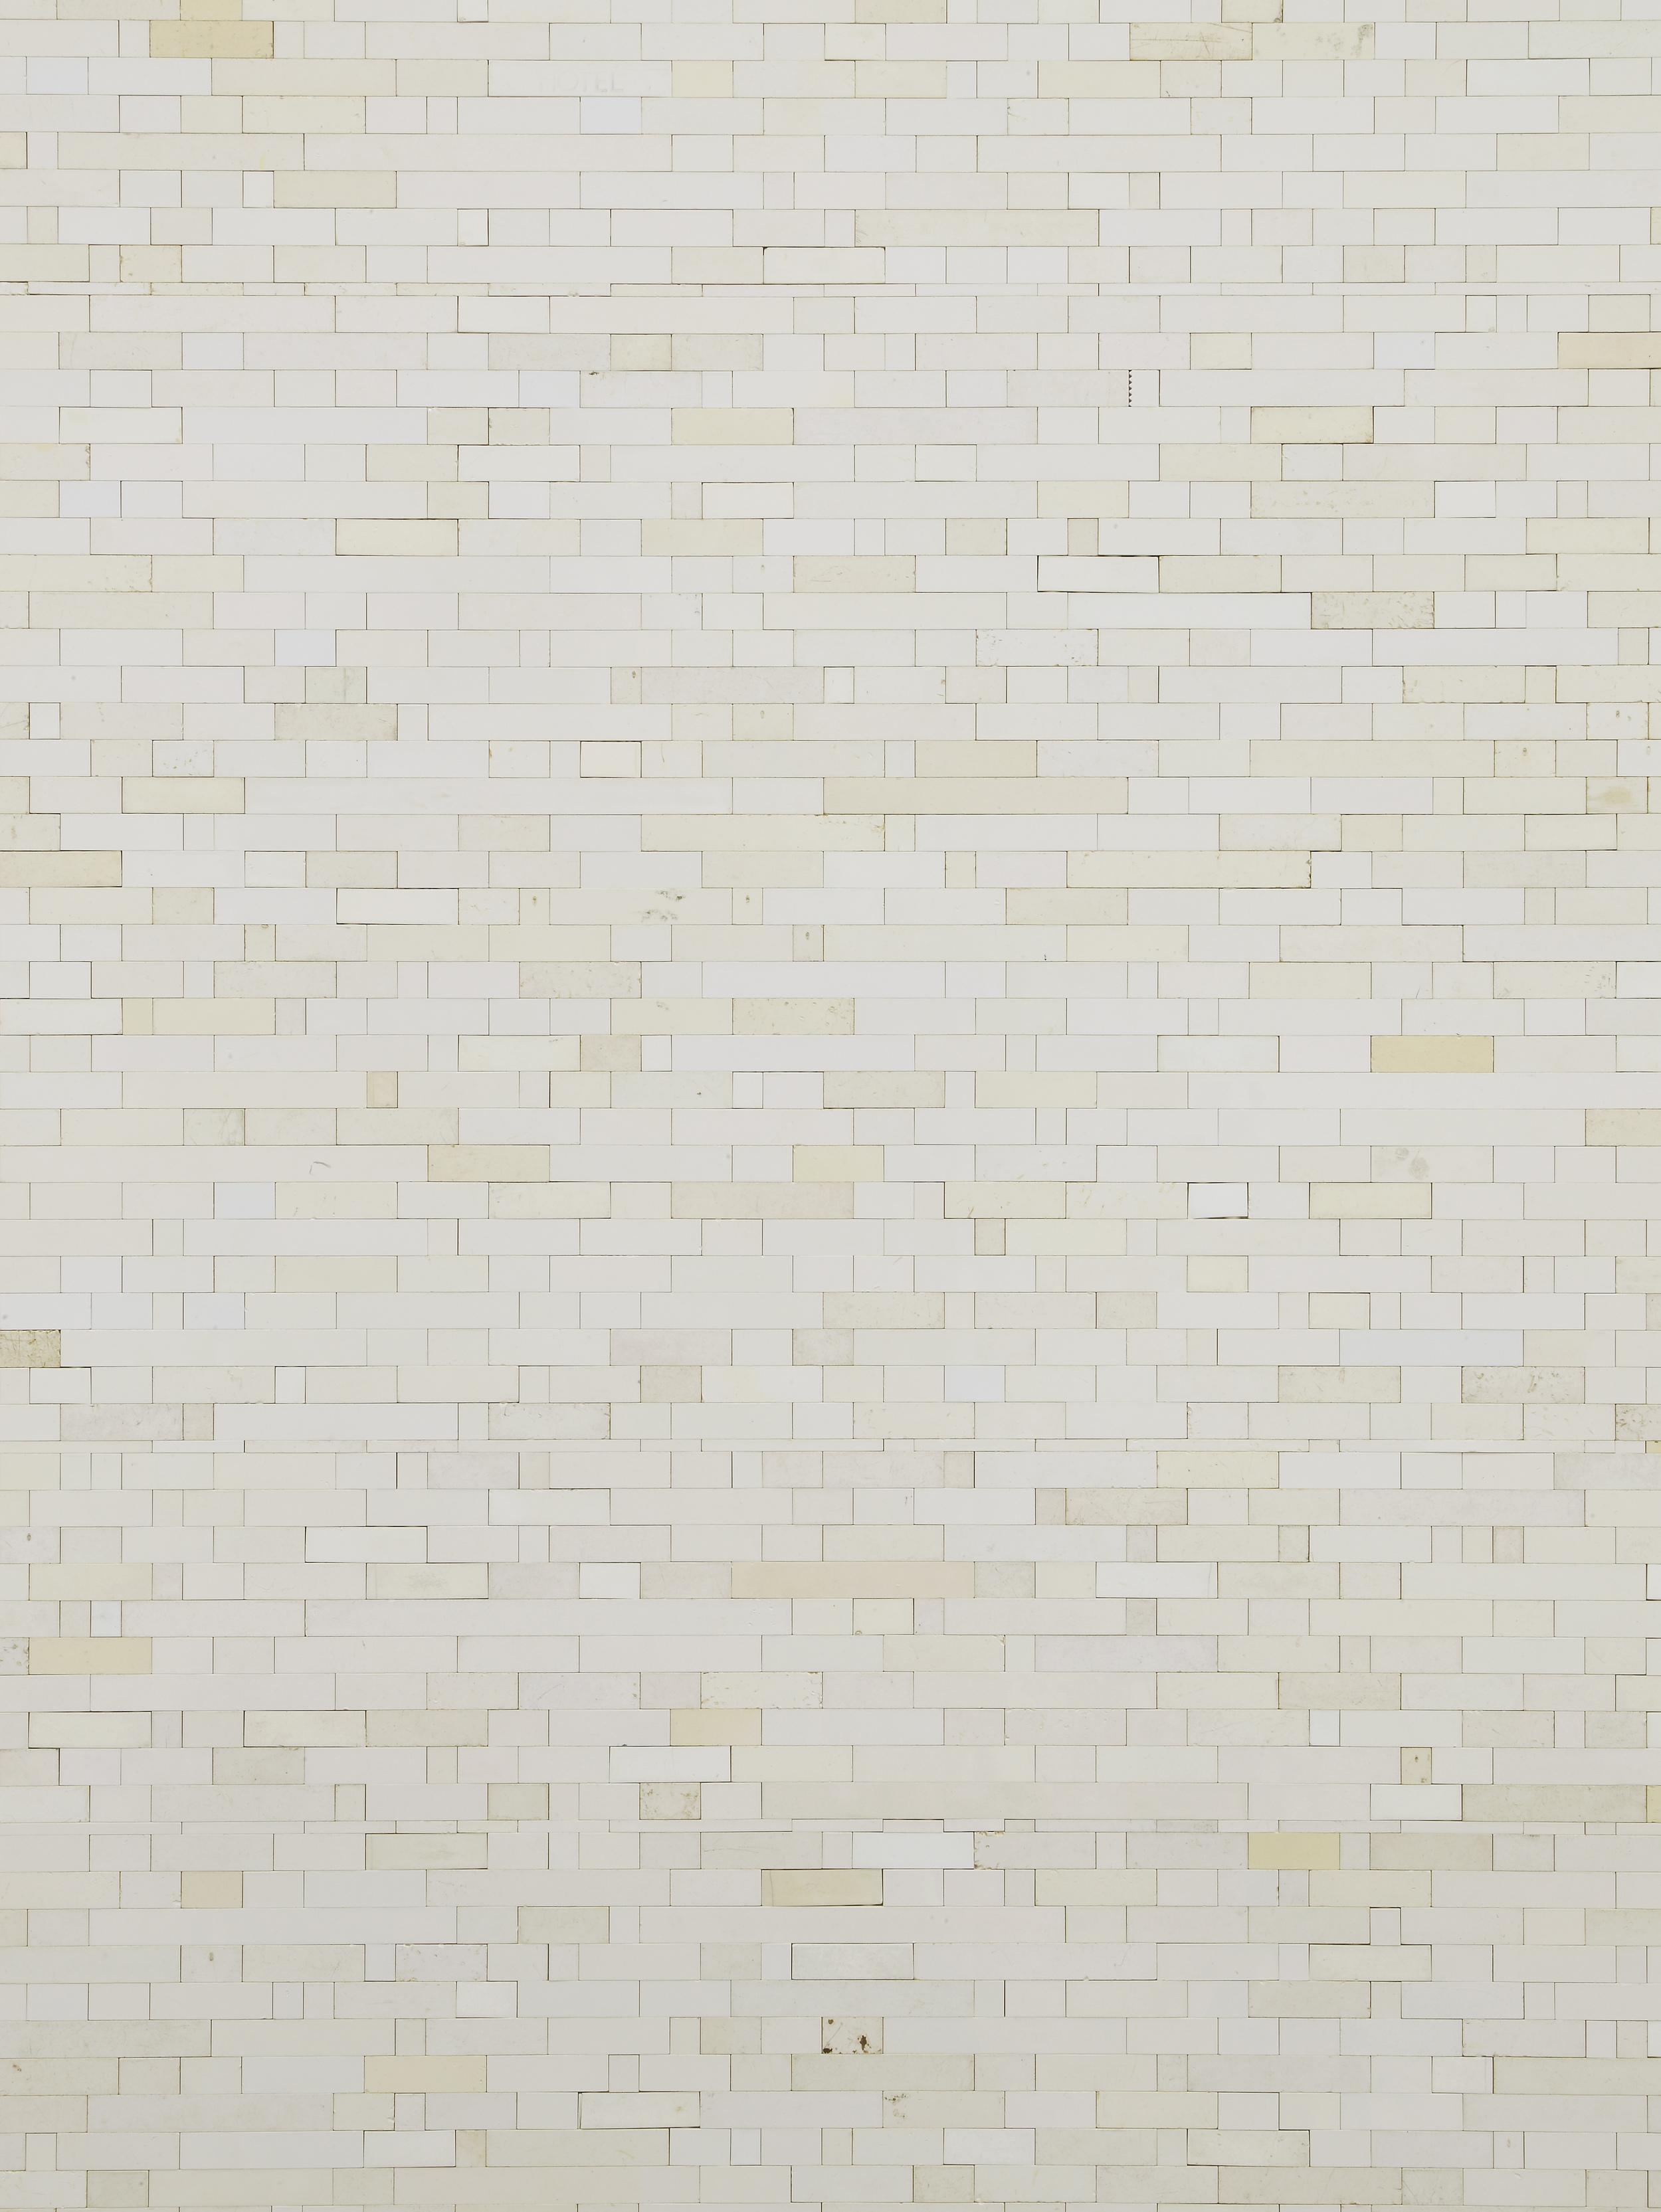 Michael Wilkinson White Wall 5 (Detail) 2013 White Lego column 185 x 33 x 50 cm / 72.8 x 11.8 x 19.6 in